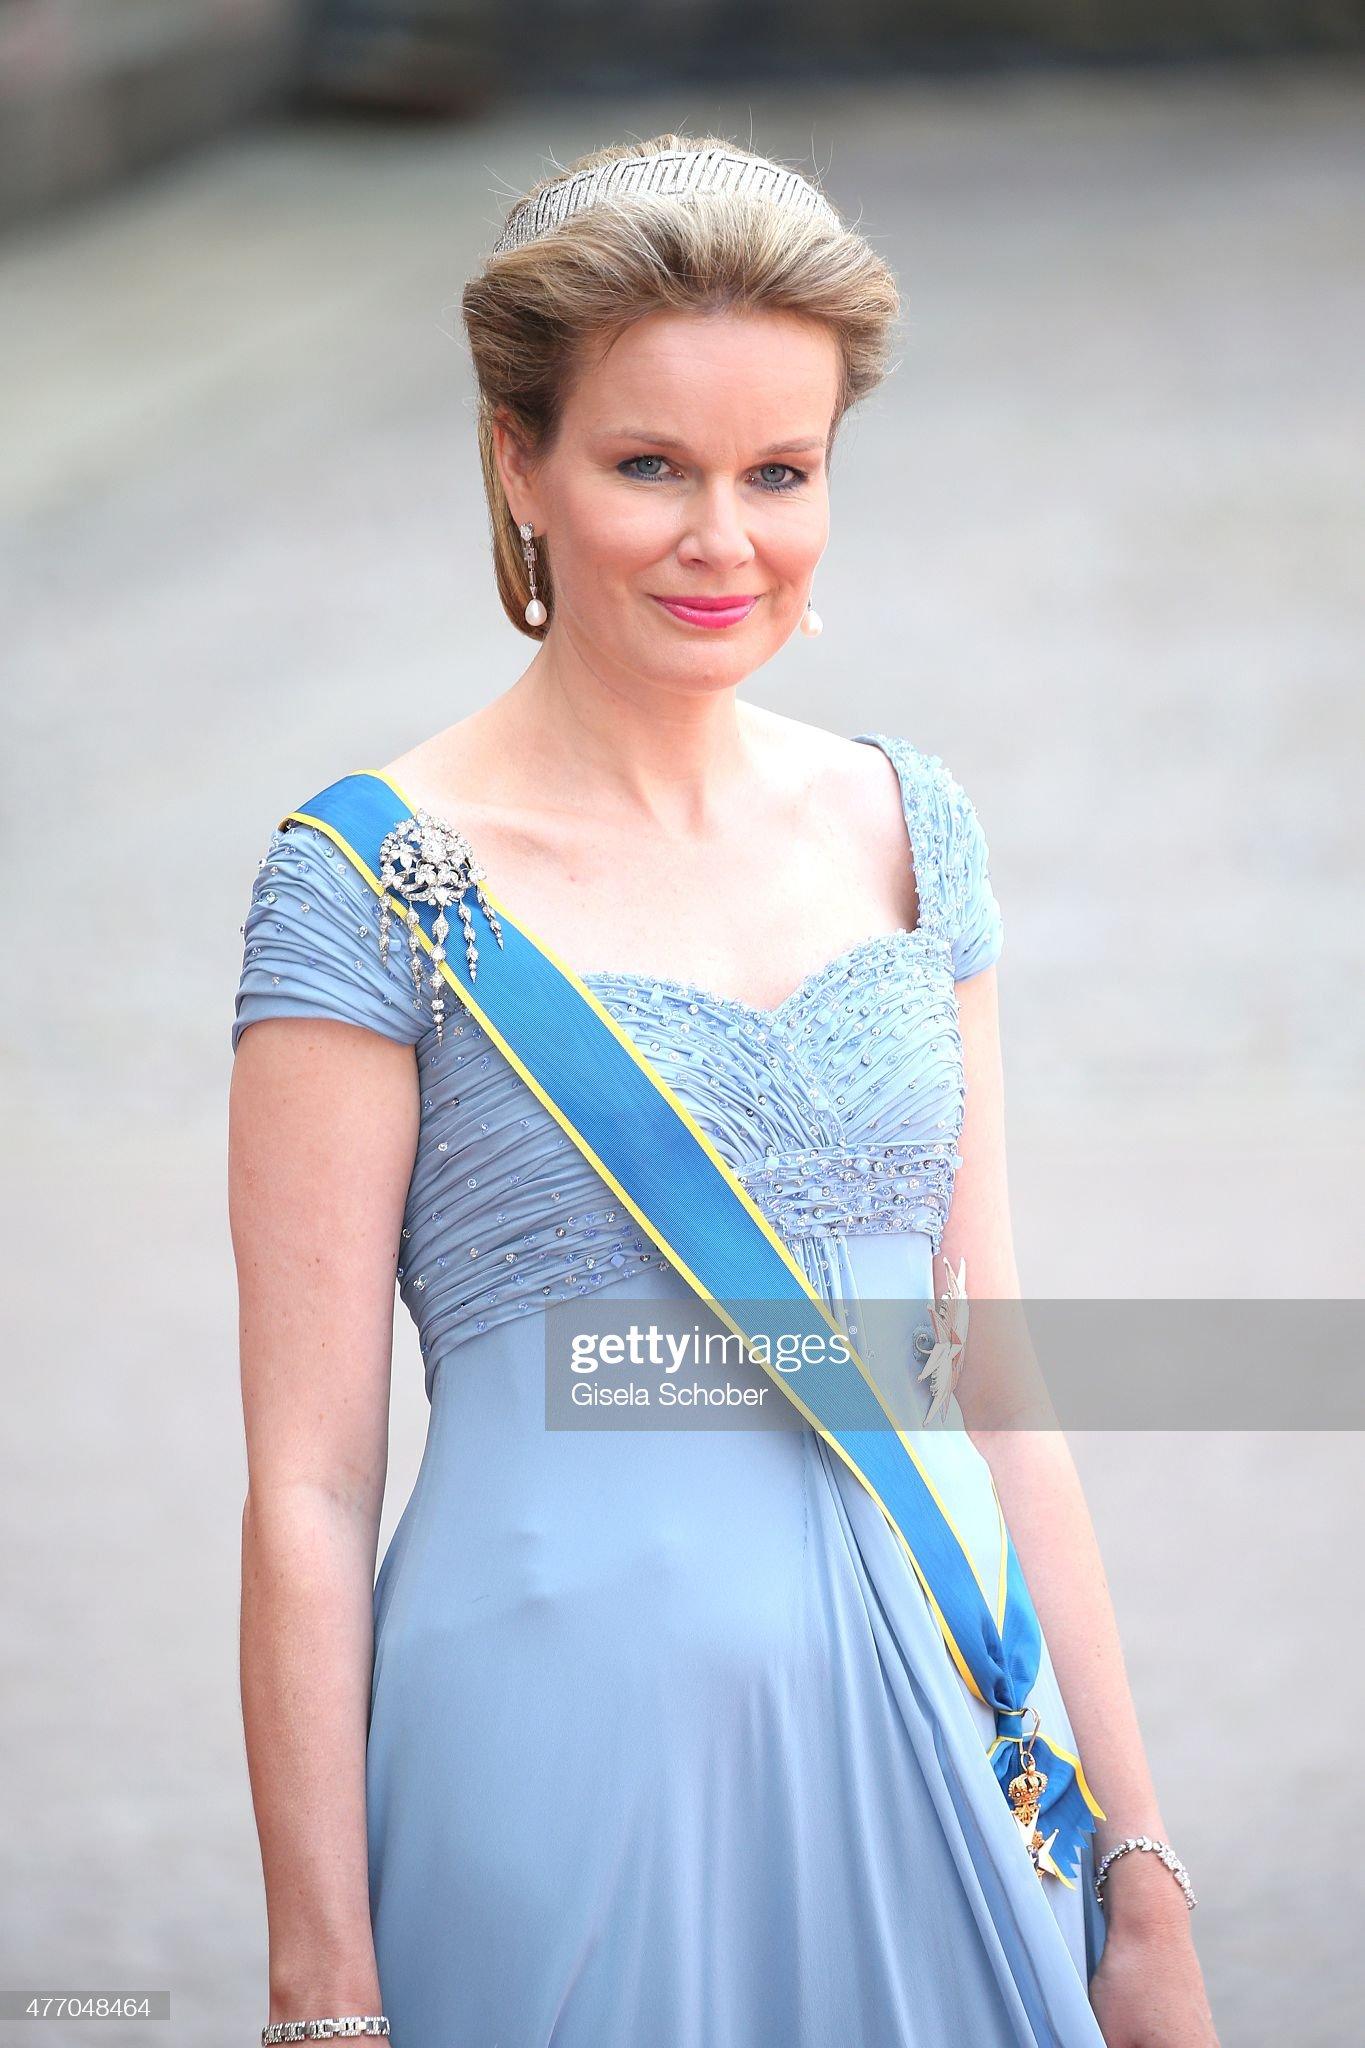 Вечерние наряды Королевы Матильды Ceremony And Arrivals: Wedding Of Prince Carl Philip Of Sweden And Sofia Hellqvist : News Photo